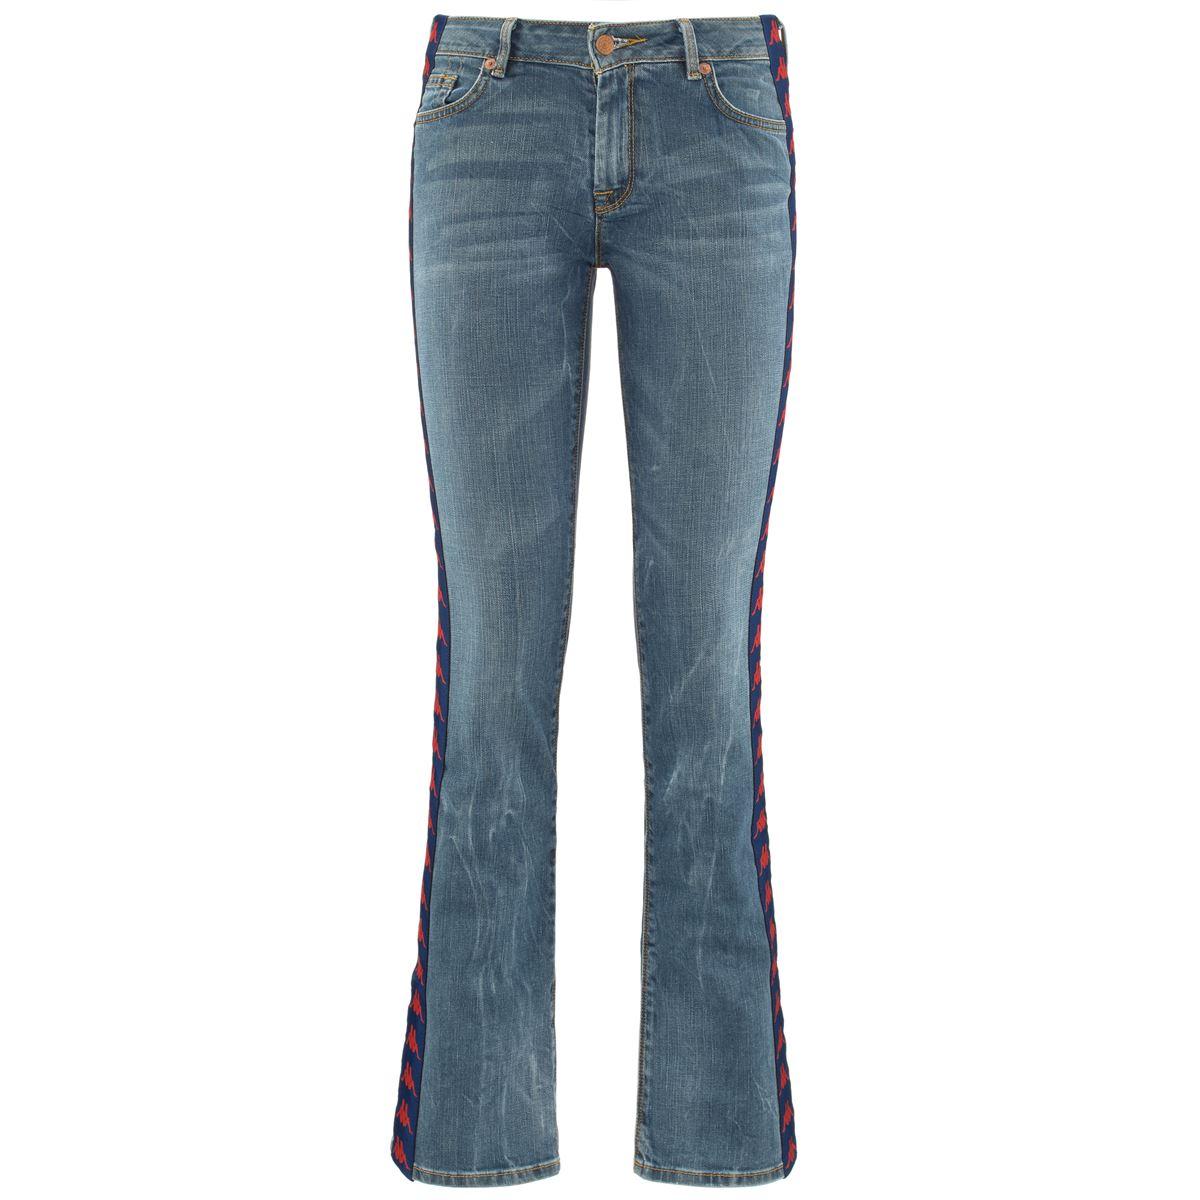 Pantaloni Jesus Jeans donna-4001RS0